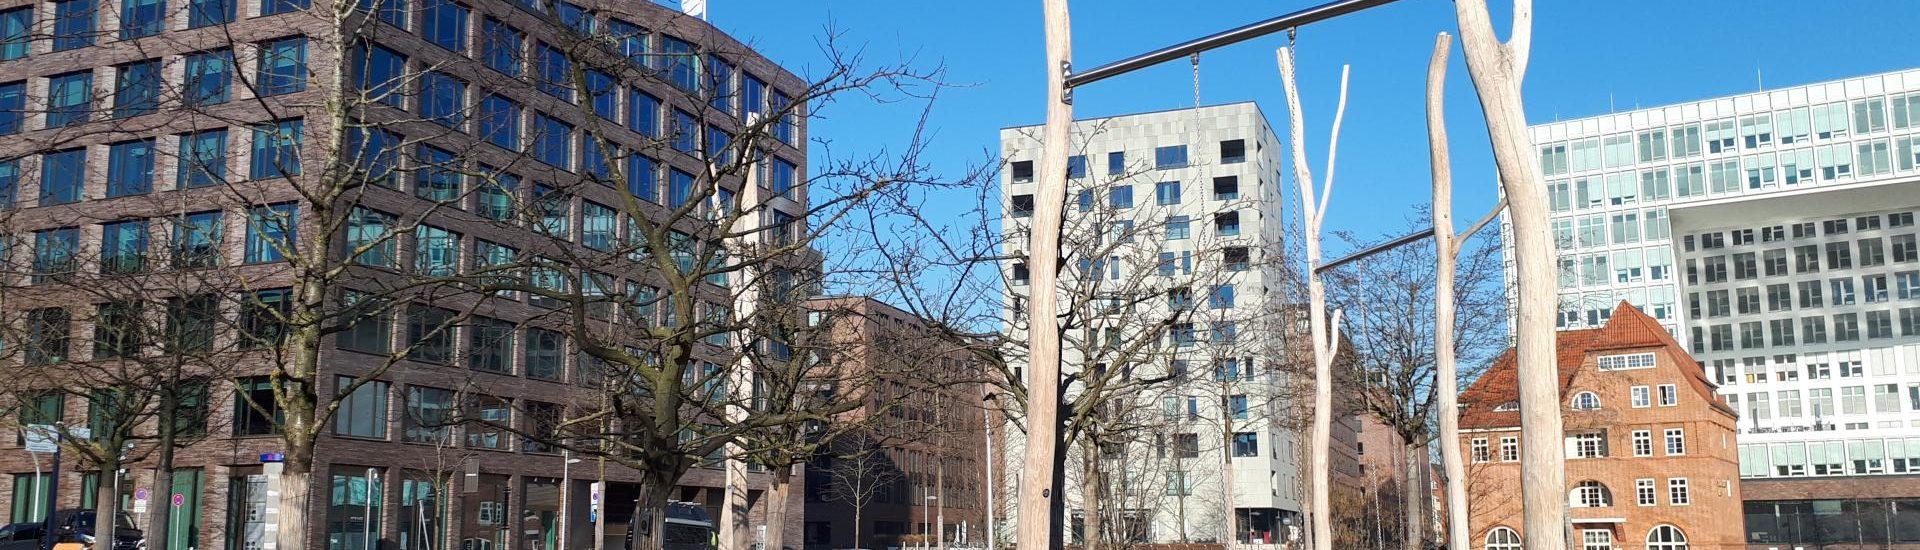 Lohsepark HafenCity Hamburg Schaukeln